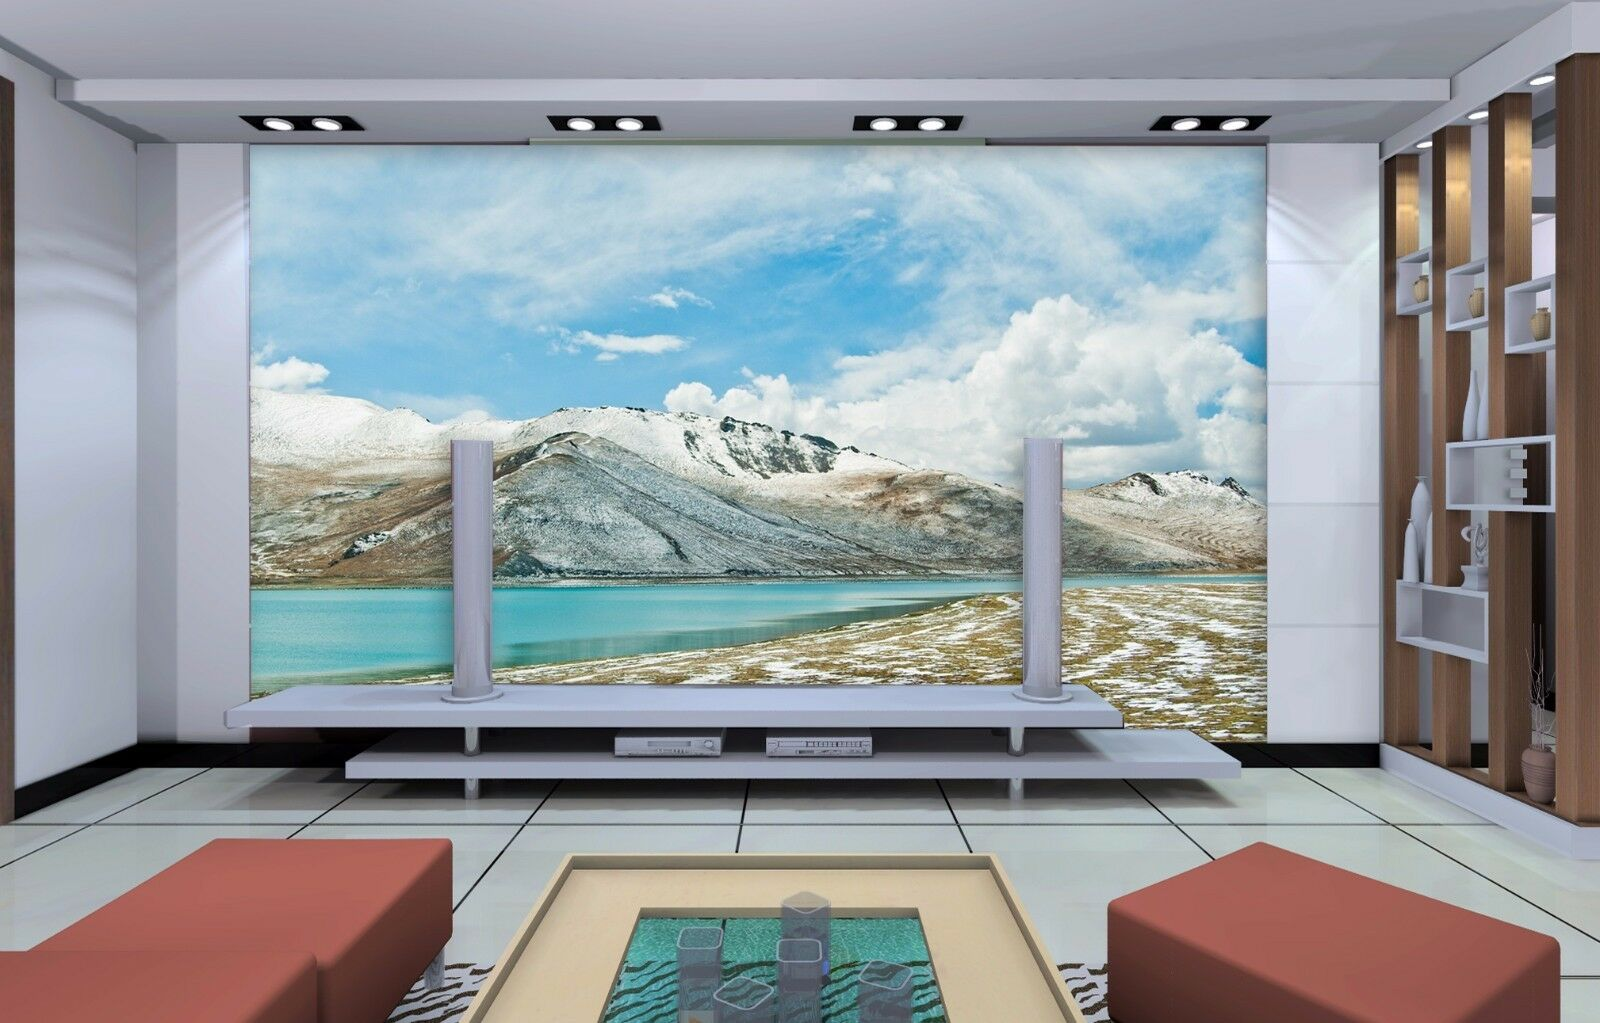 3D Hills River 447 Wallpaper Murals Wall Print Wallpaper Mural AJ WALL UK Summer